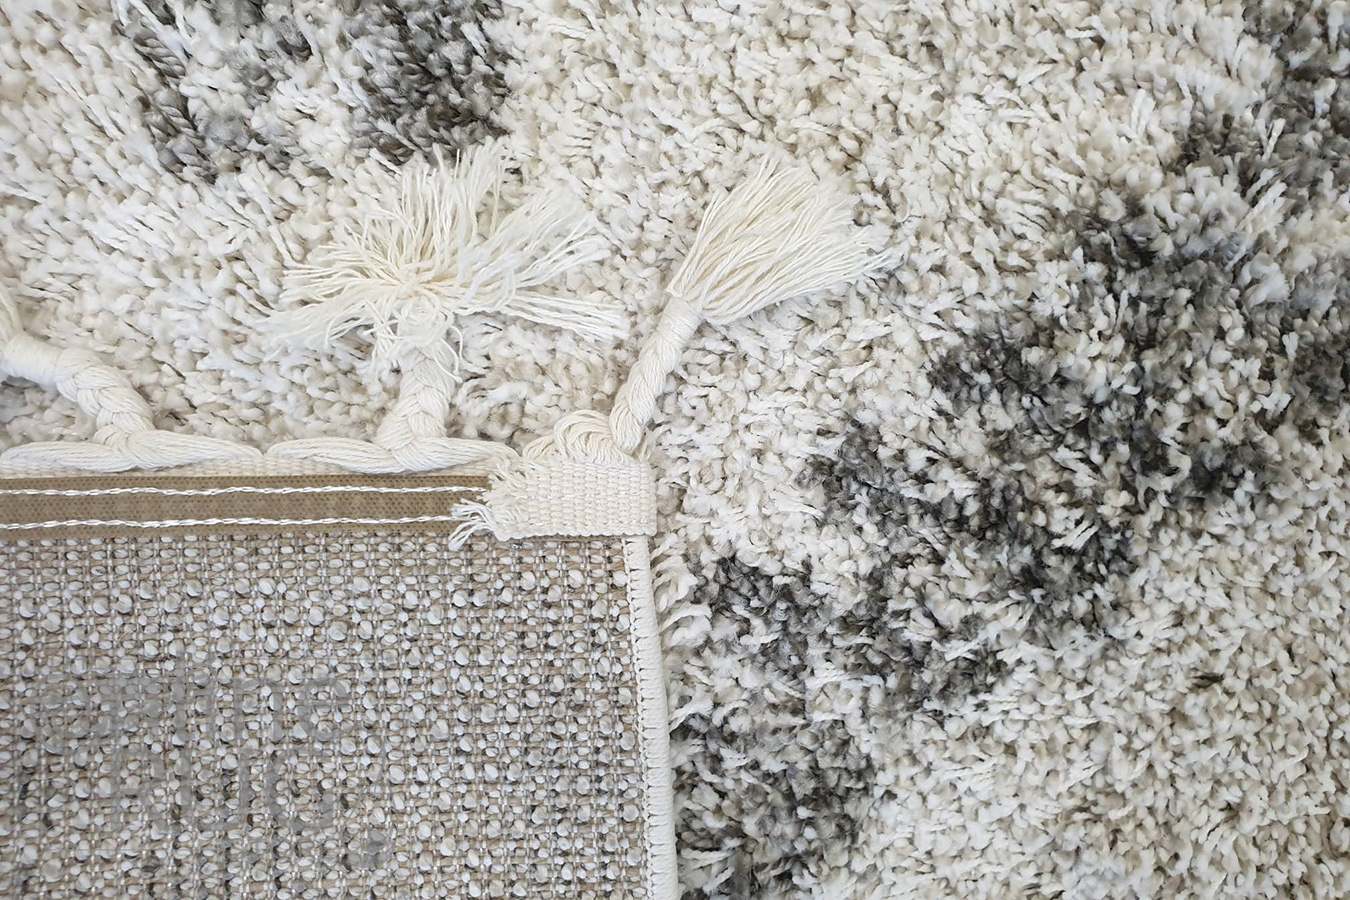 Saffia Natural Ethnic Prints Plush Boho Rug